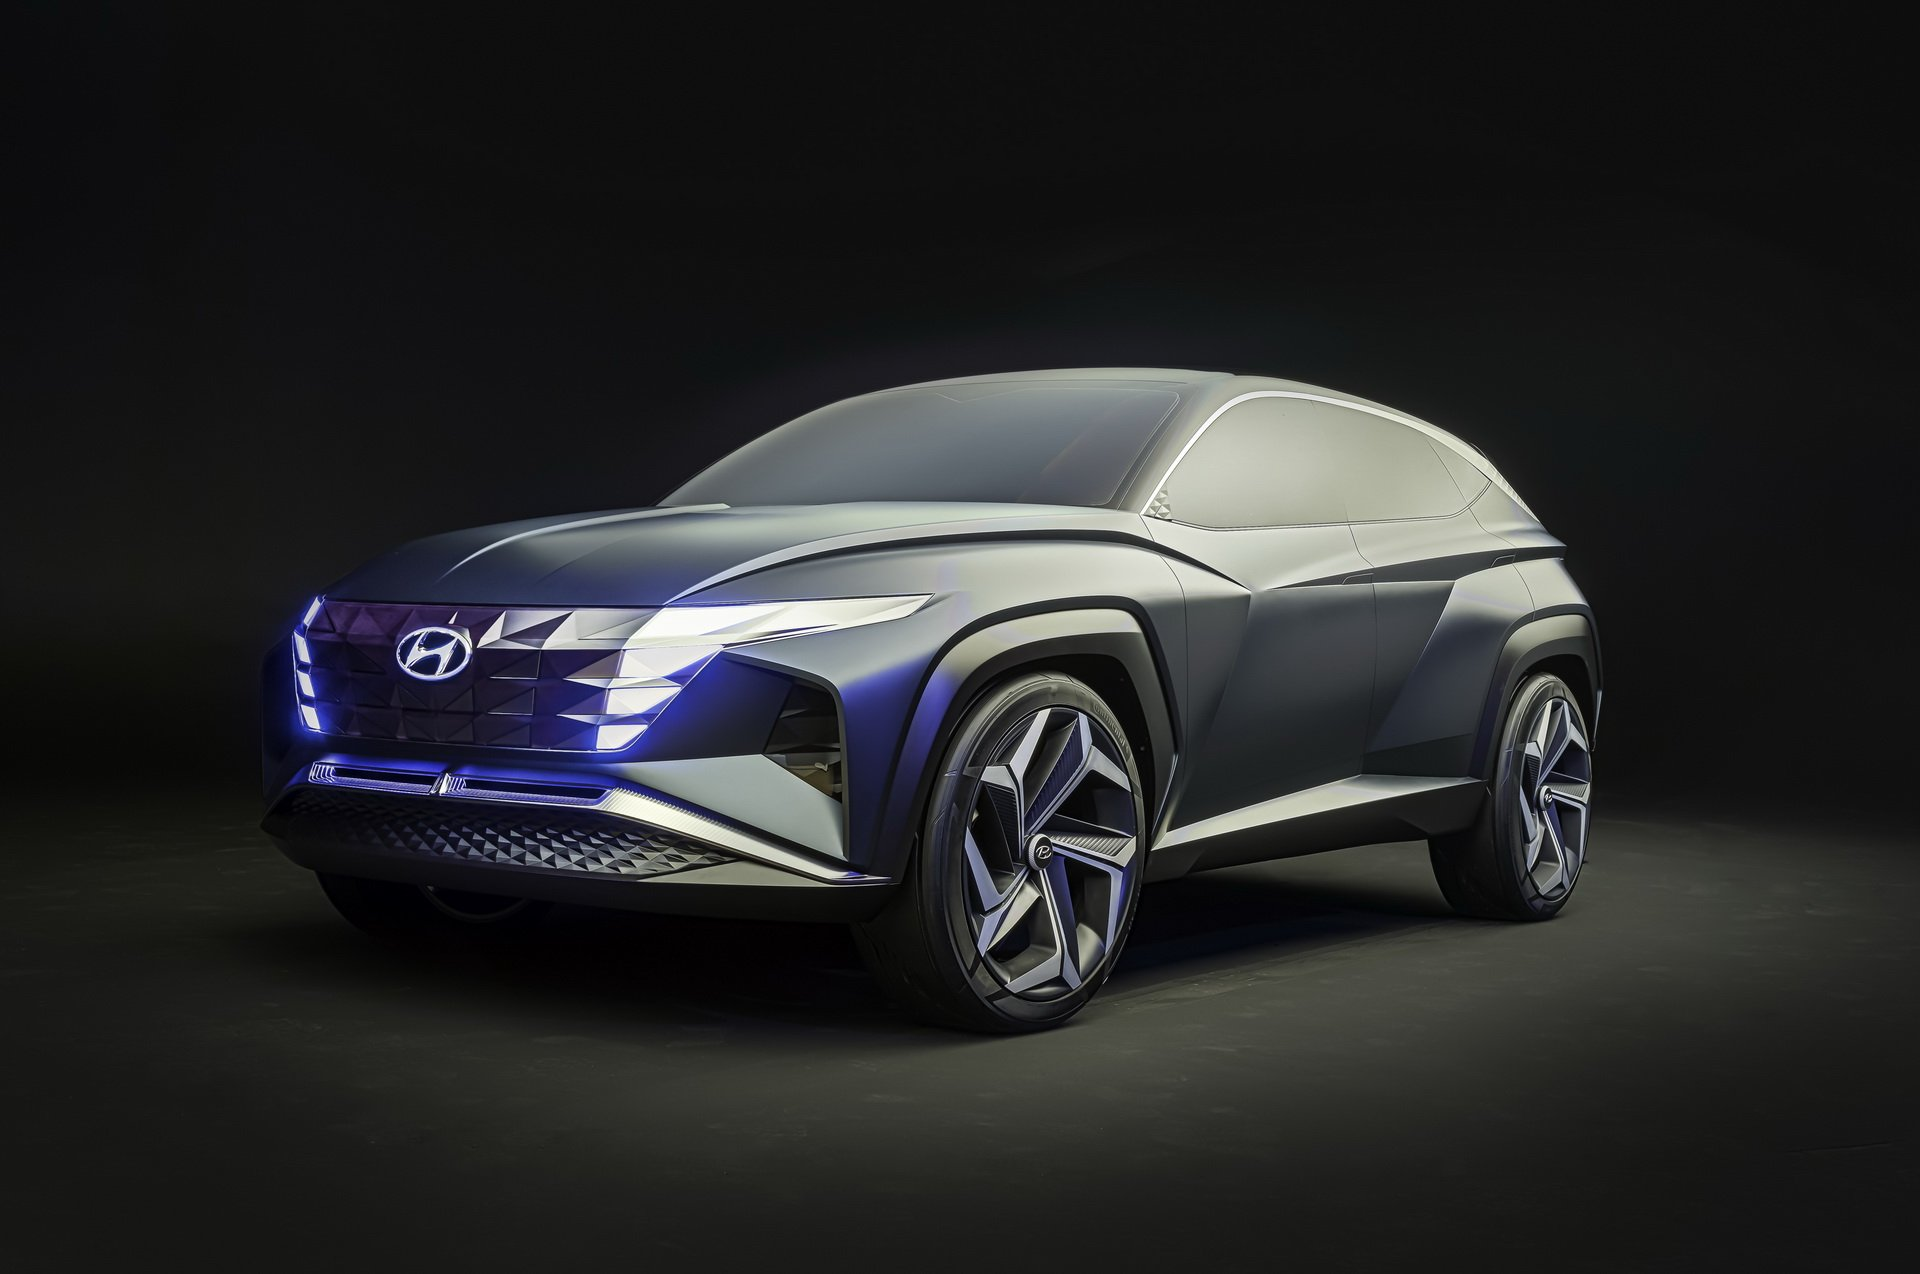 Hyundai Vision T SUV Concept